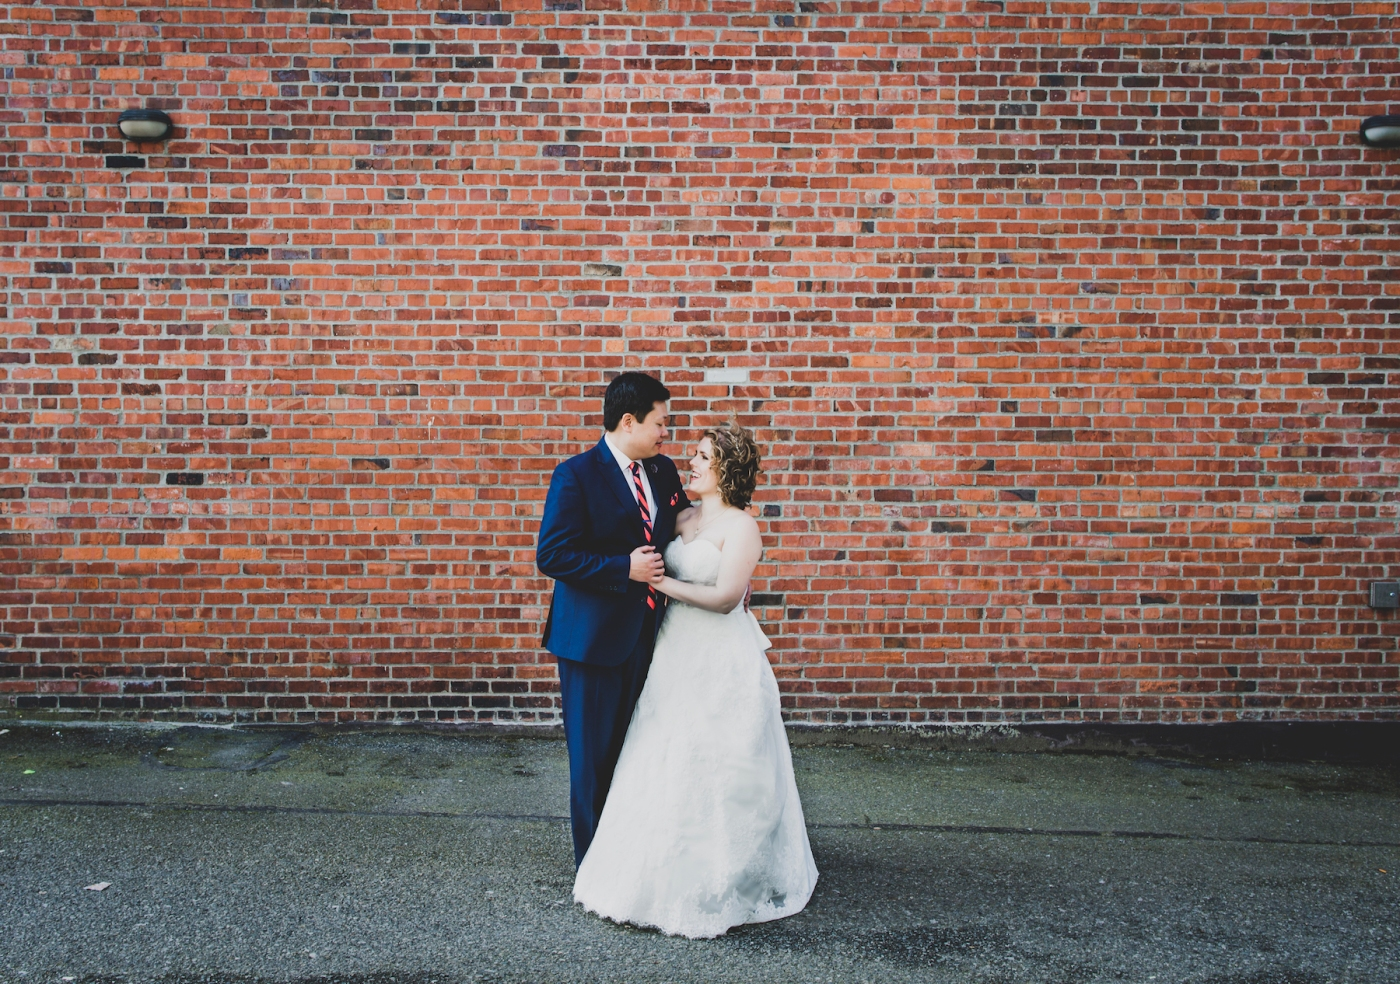 DSC_2119Everett_Wedding_Ballroom_Jane_Speleers_photography_Rachel_and_Edmund_Bridesmaids_peach_dresses_groomsmen_2017